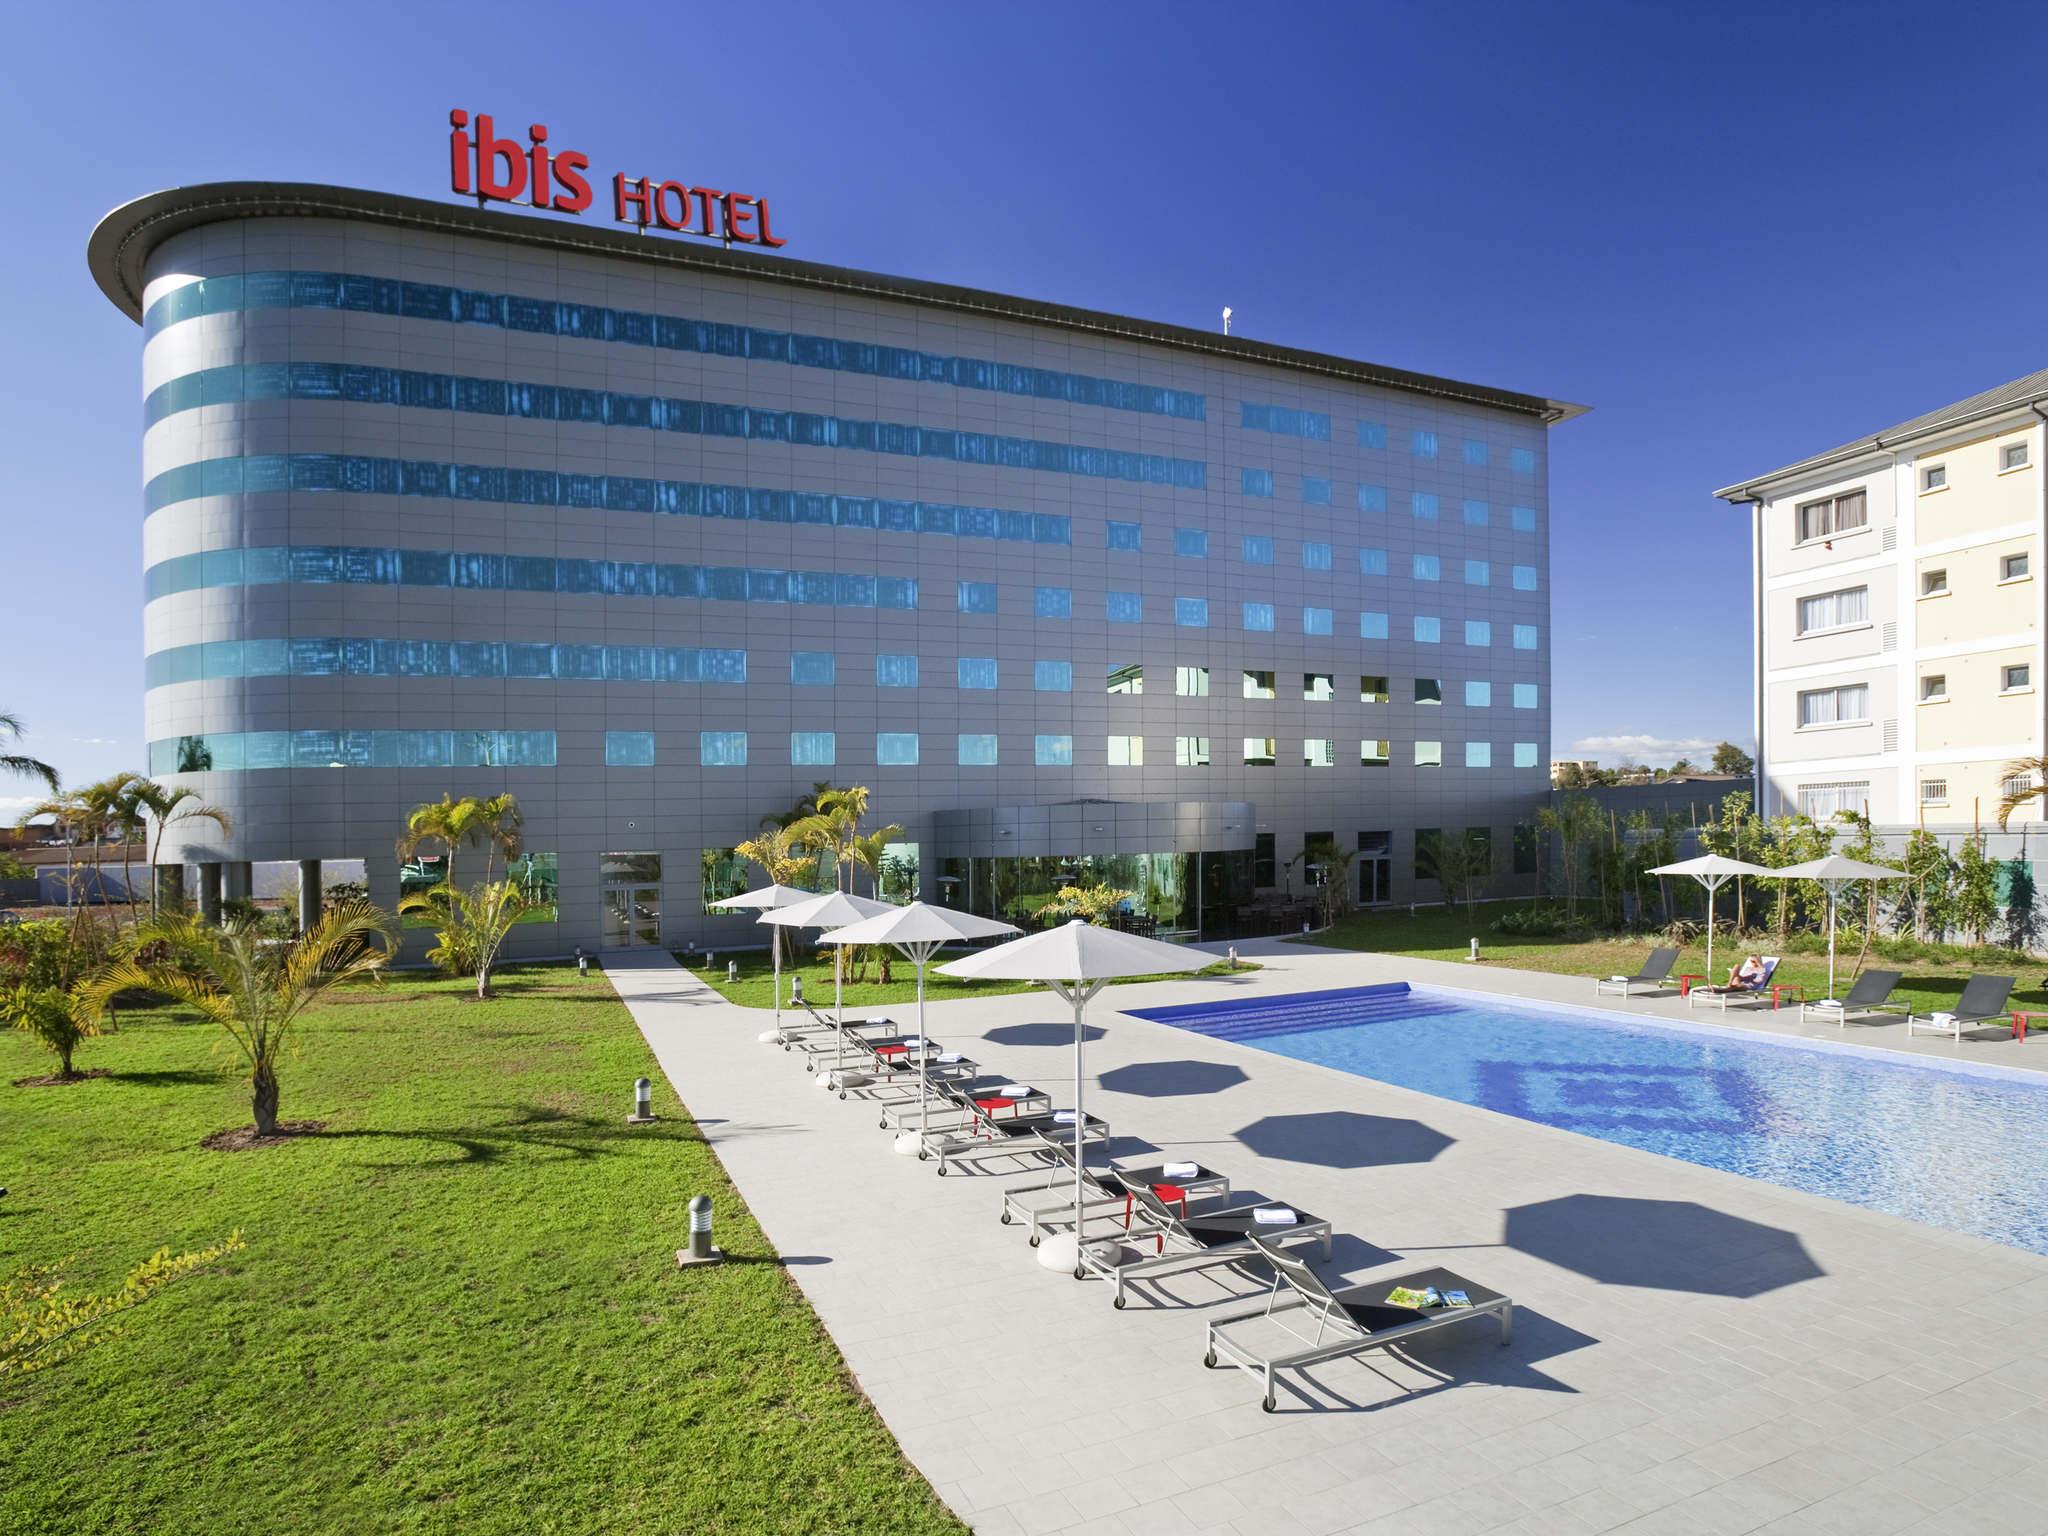 فندق - إيبيس ibis أنتاناناريفو أنكوروندرانو